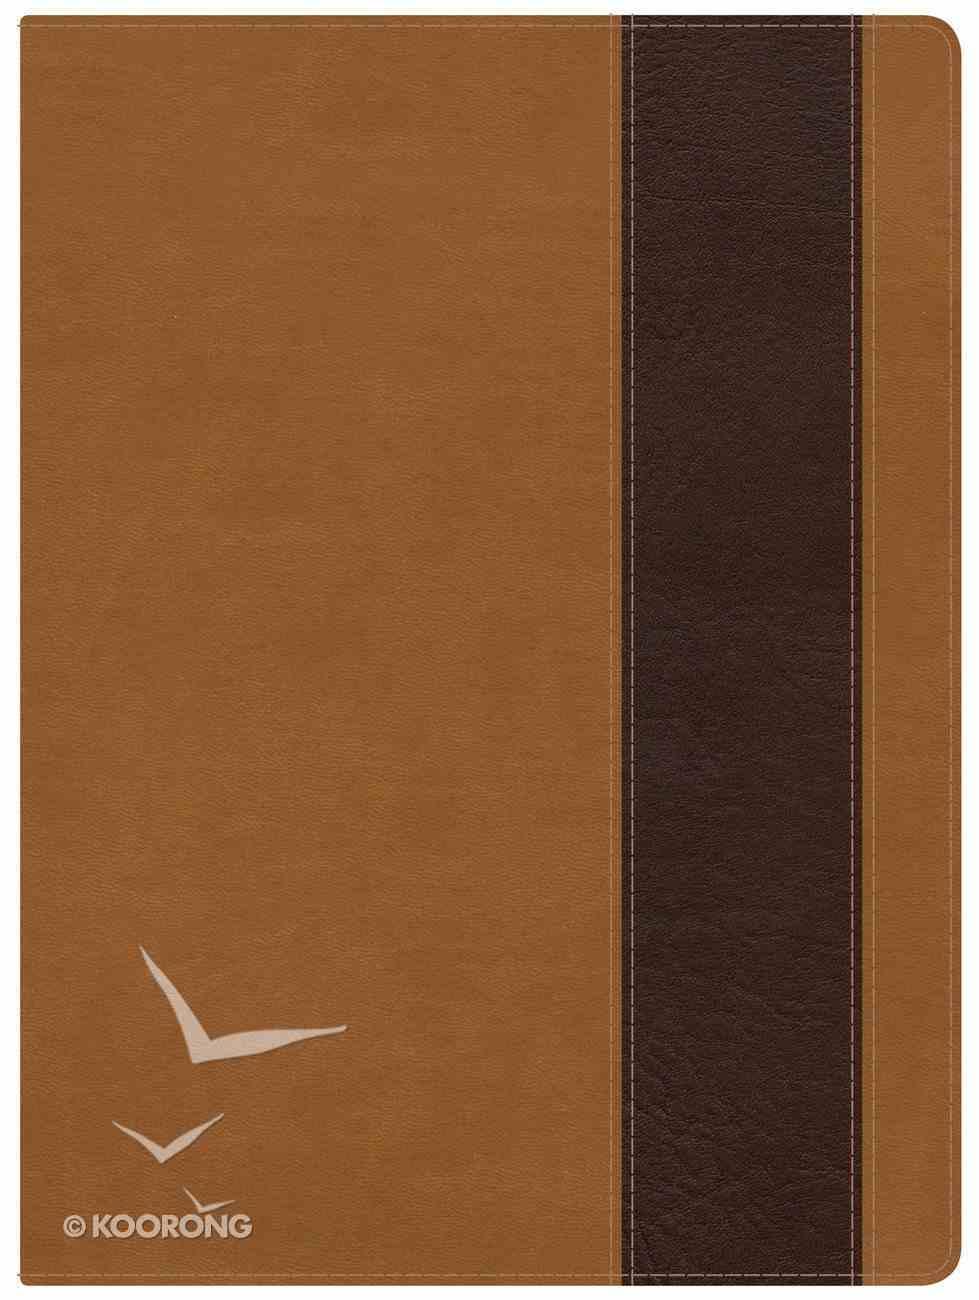 NKJV Holman Study Bible Suede/Chocolate Imitation Leather